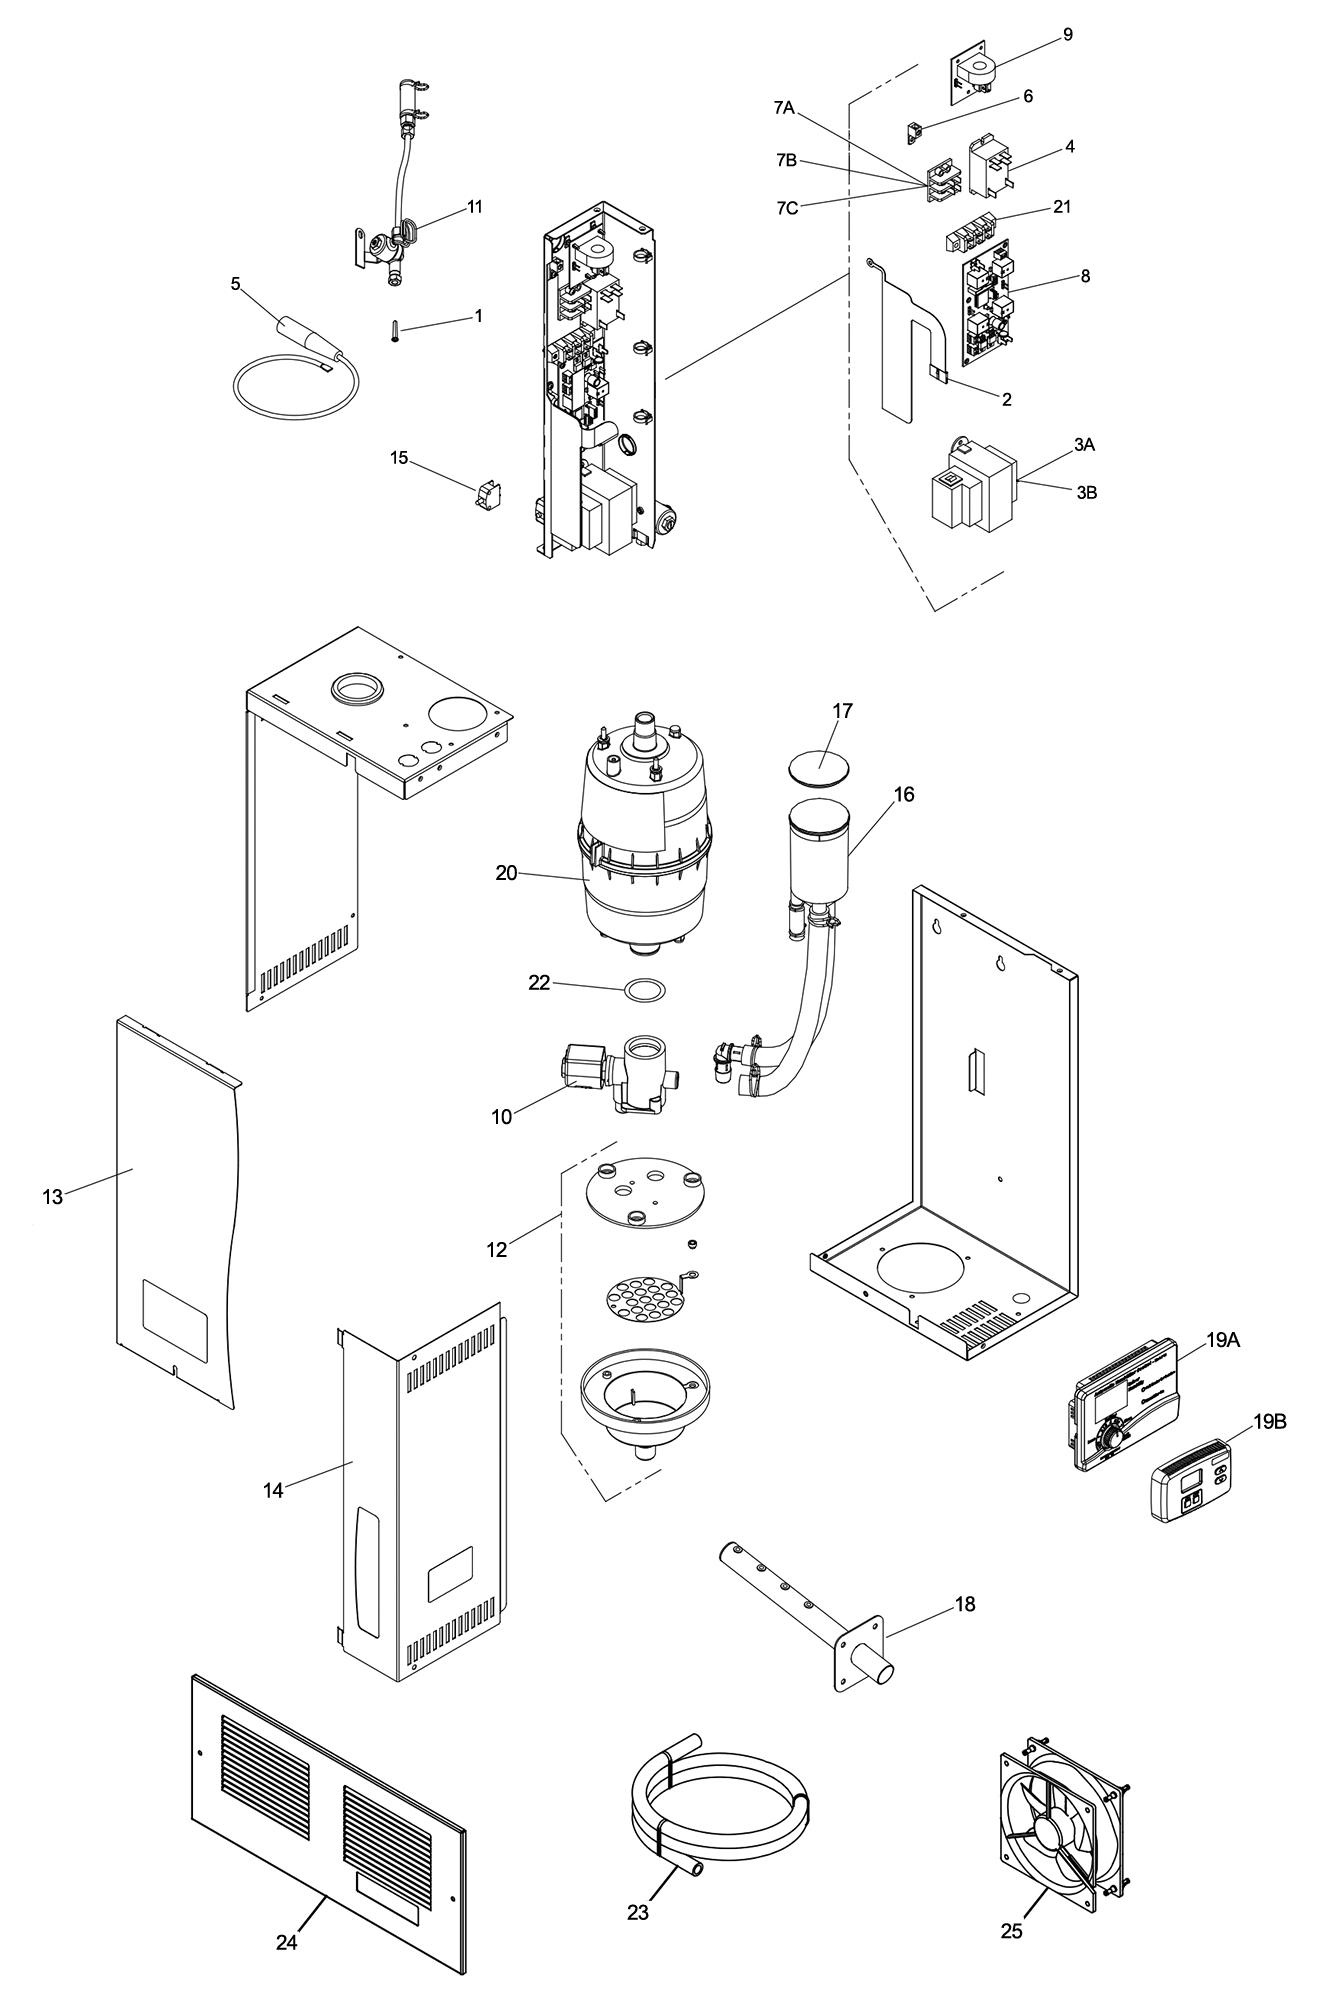 Parts